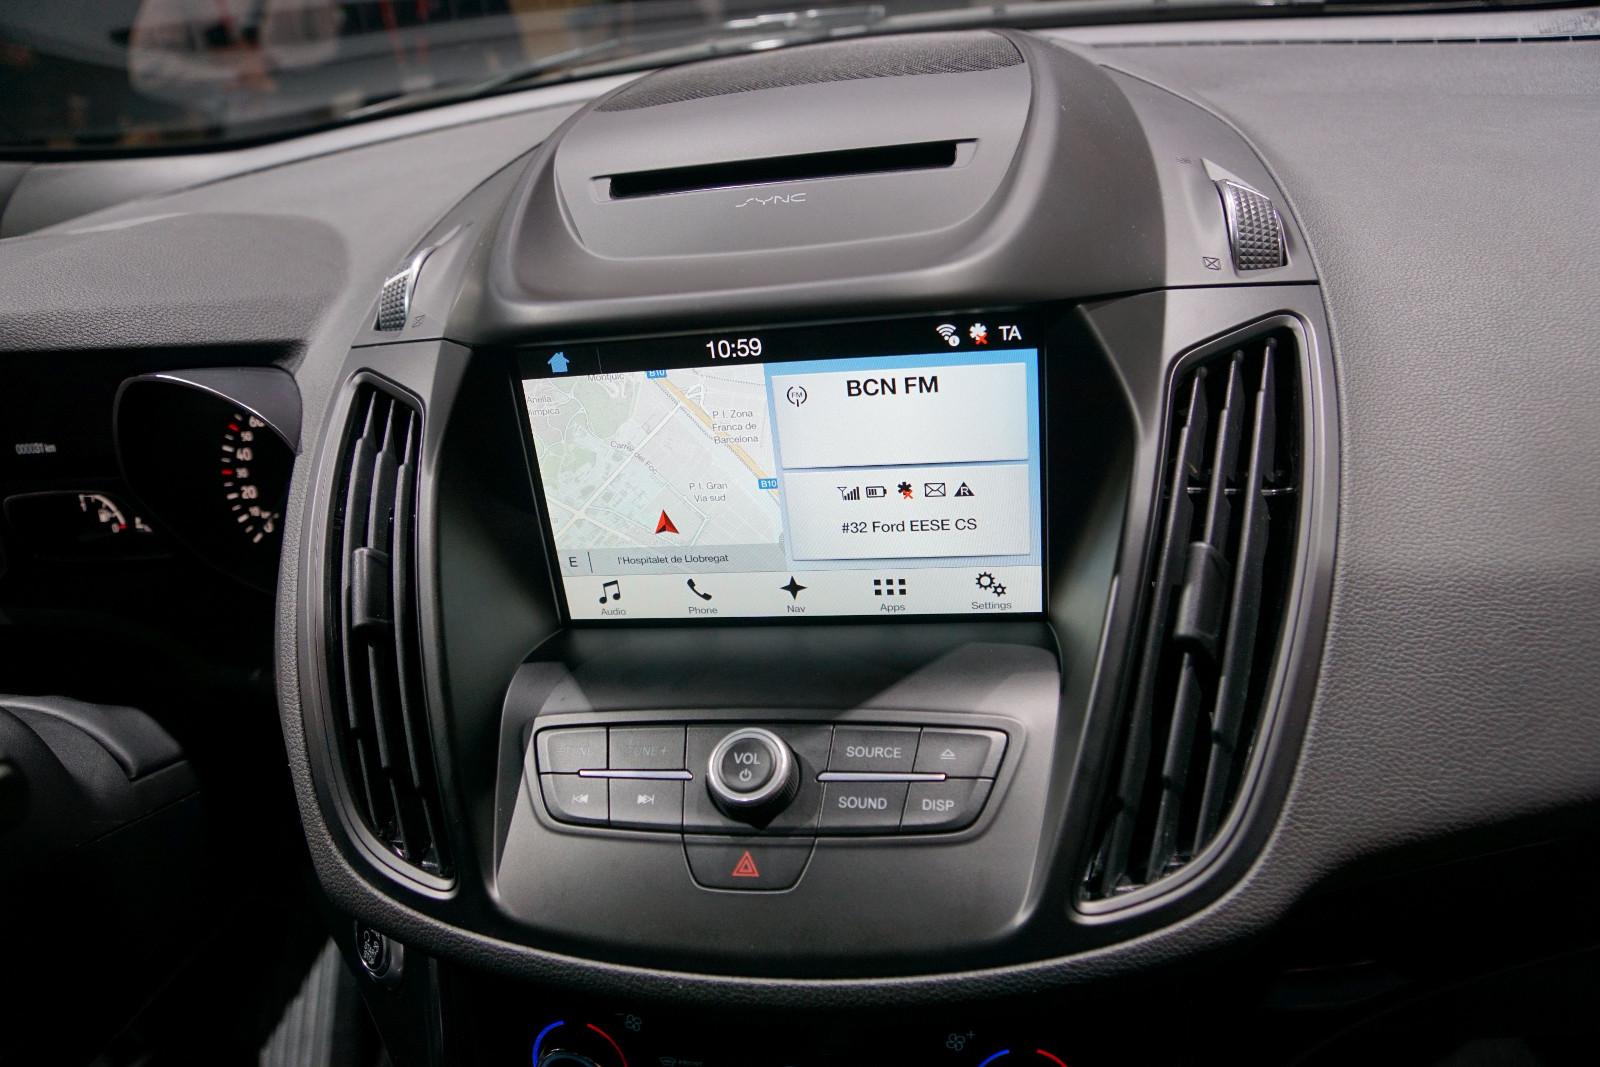 mwc 2016 mehr ford smart mobility mit sprachgesteuertem in car system sync 3. Black Bedroom Furniture Sets. Home Design Ideas